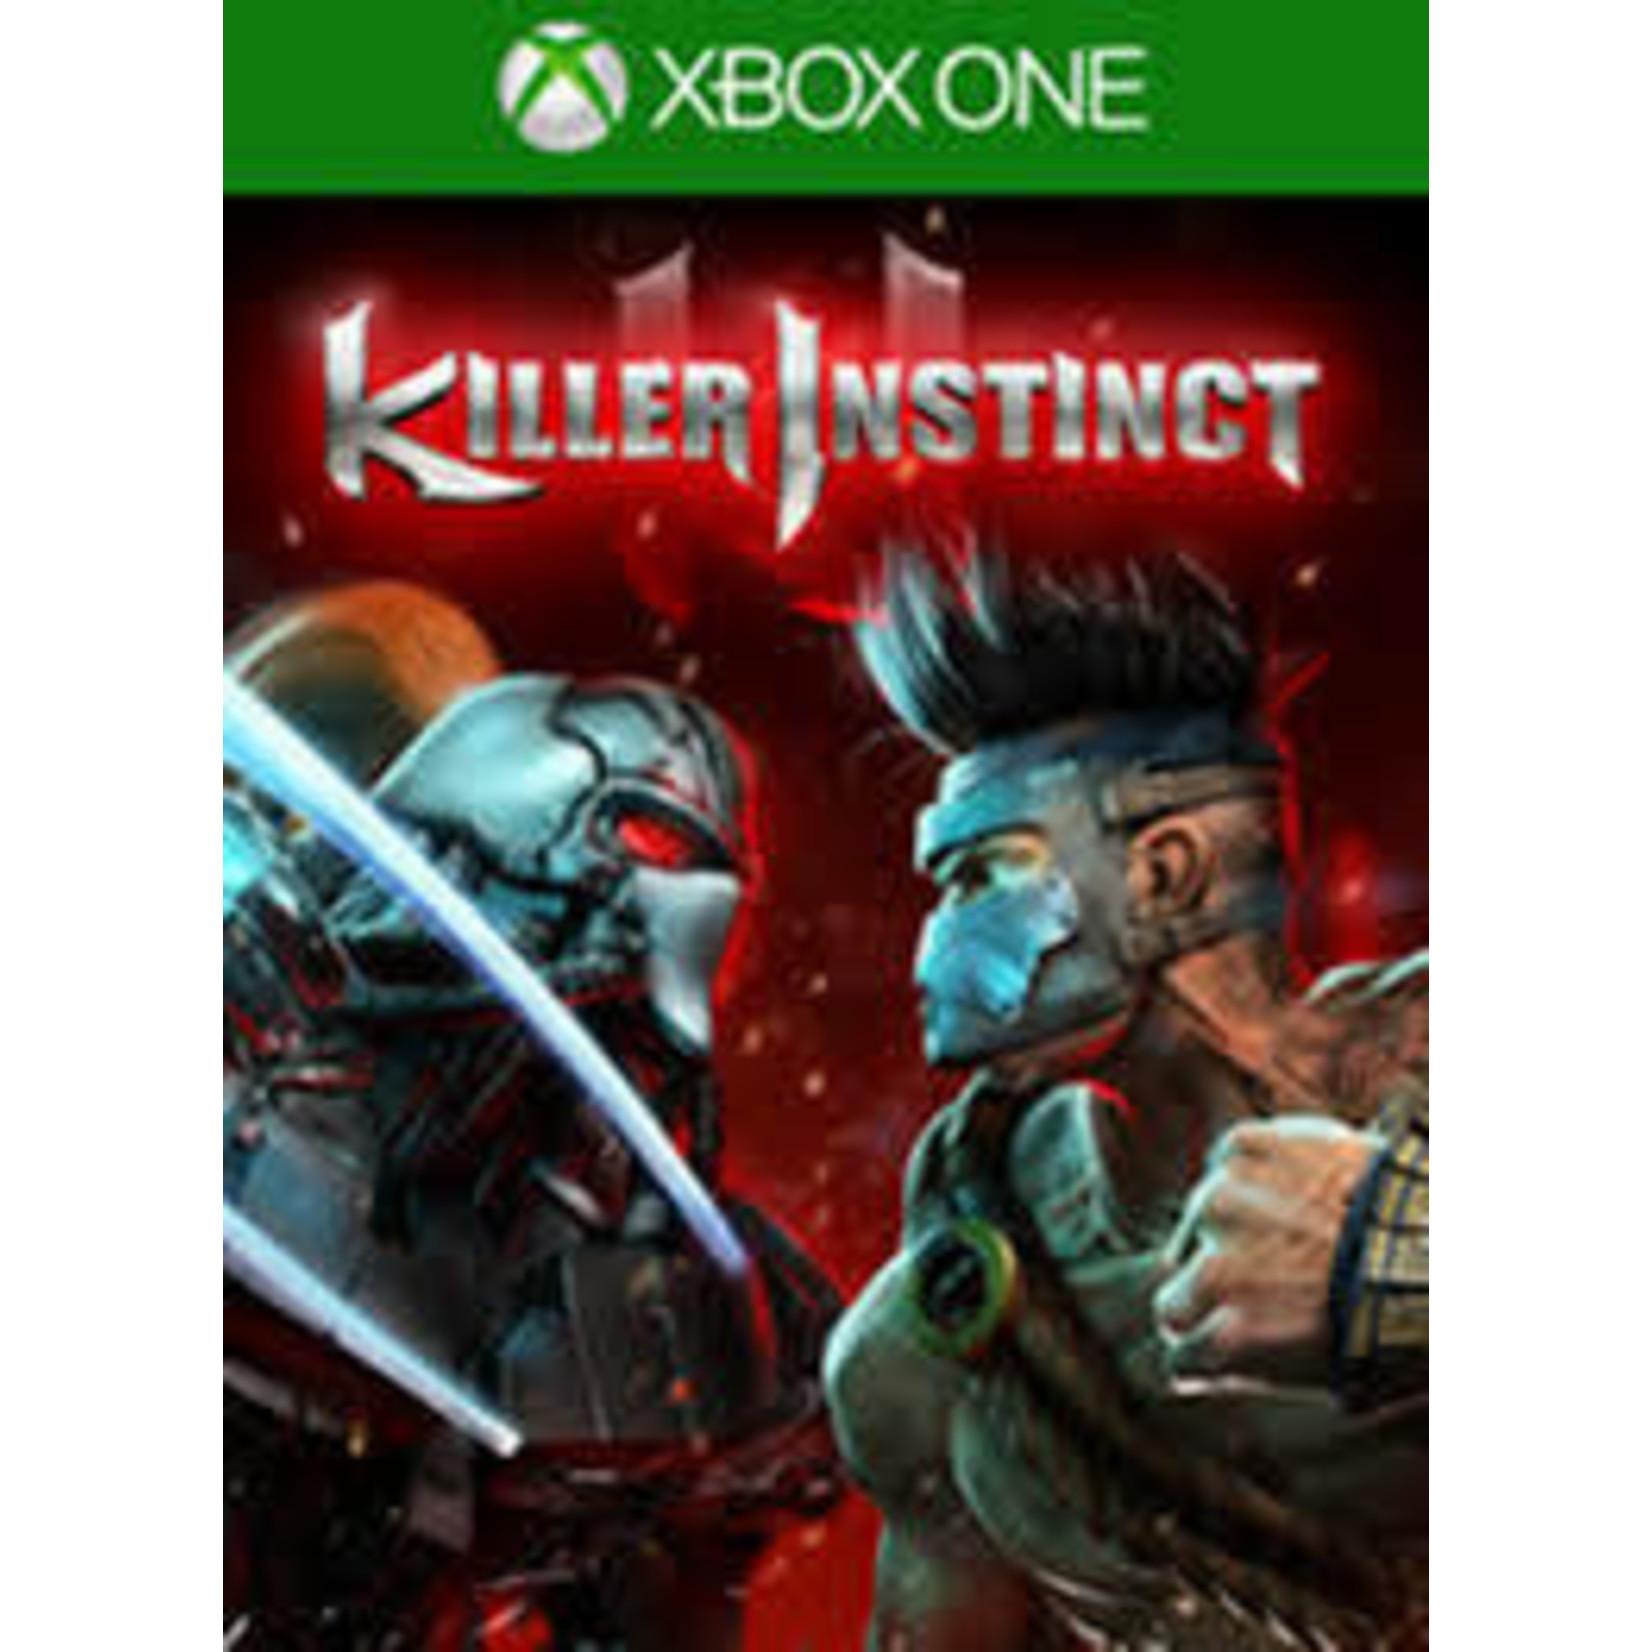 XB1U-Killer Instinct